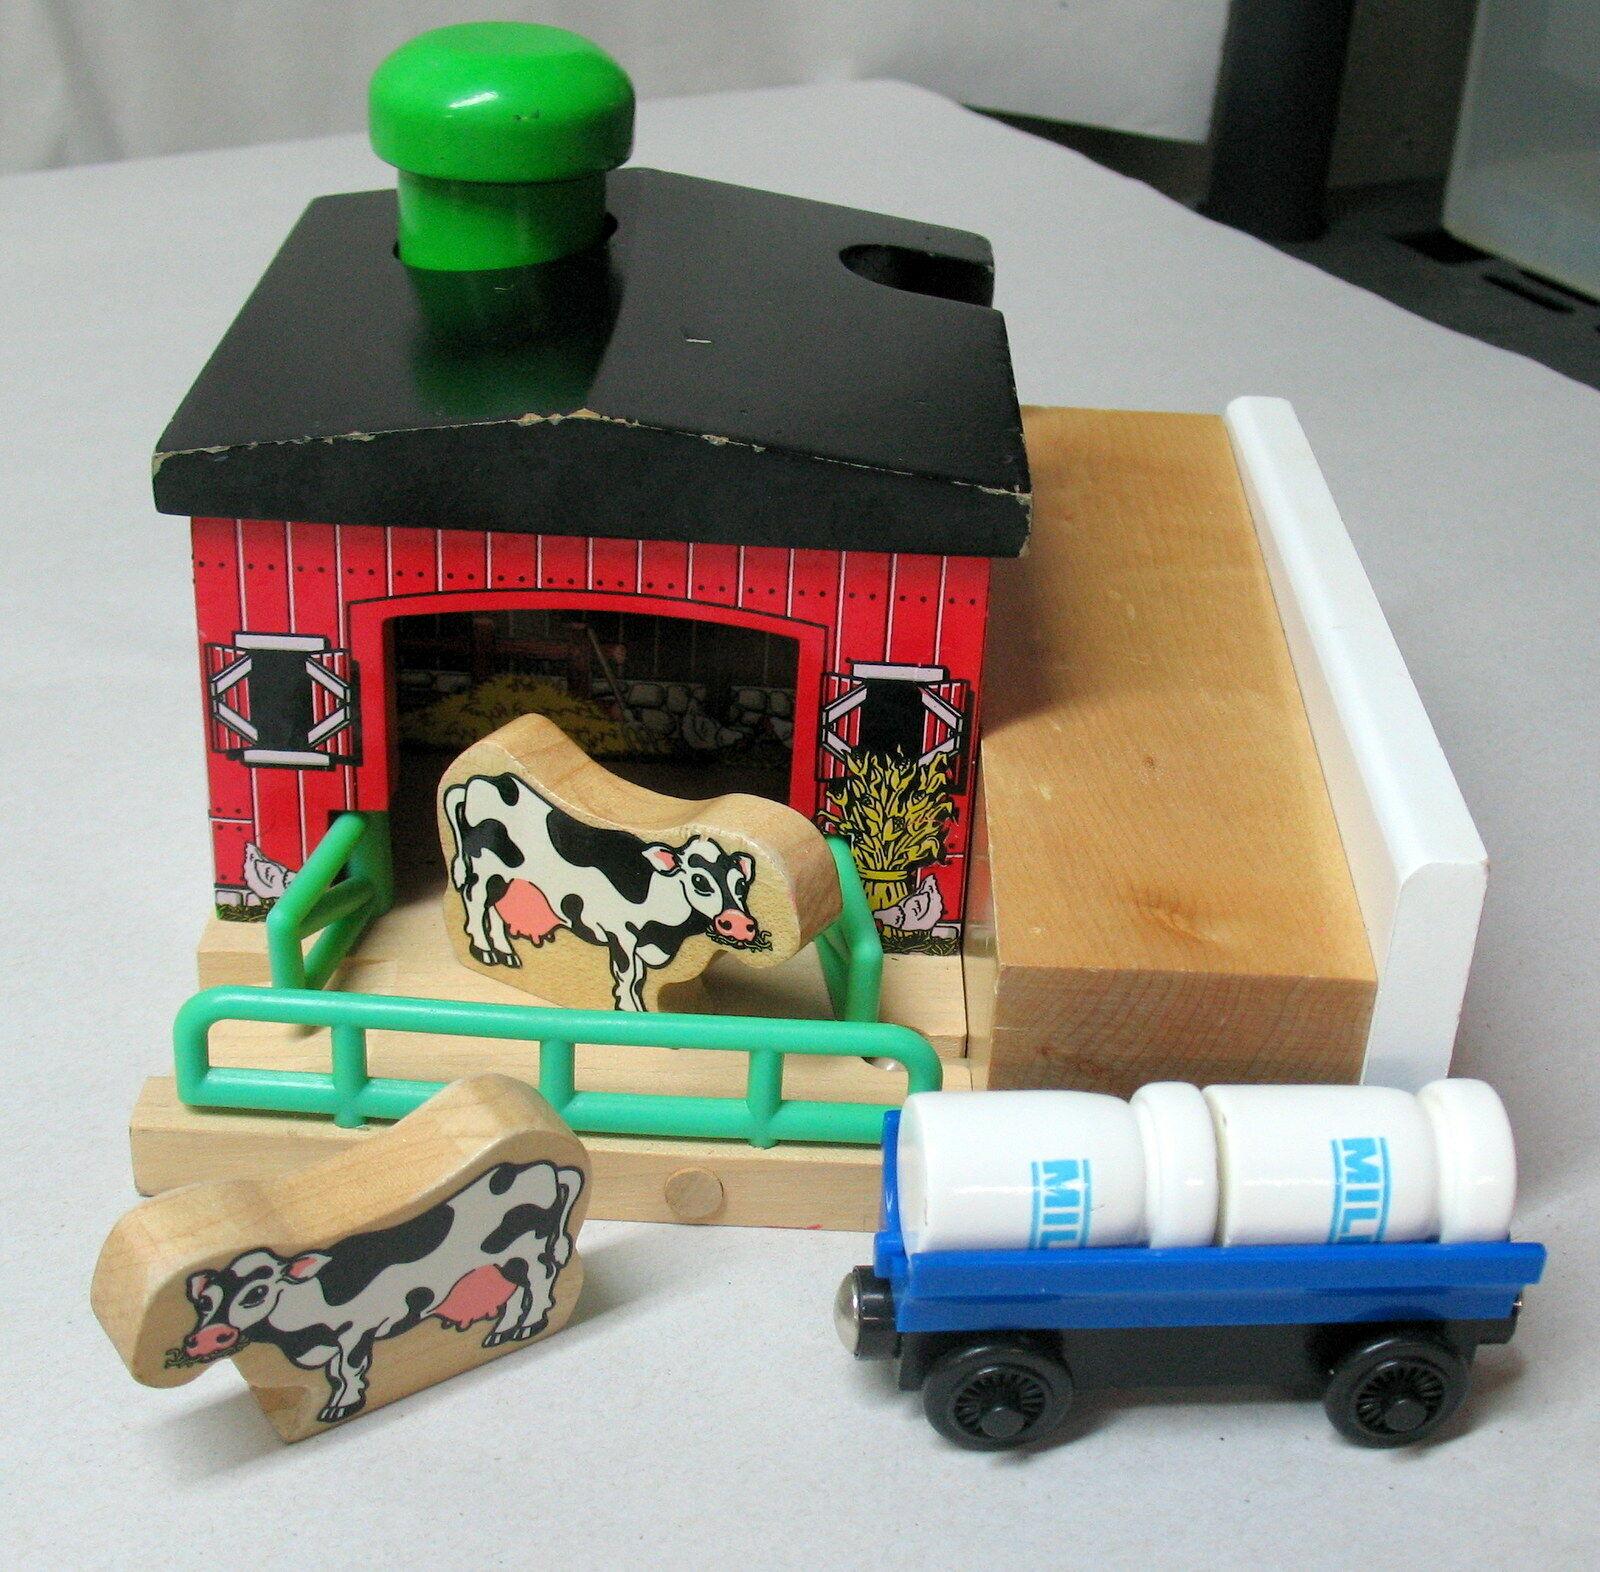 SODOR DAIRY FARM, Thomas & Friends, Wooden Railway, 2001, Complete Set